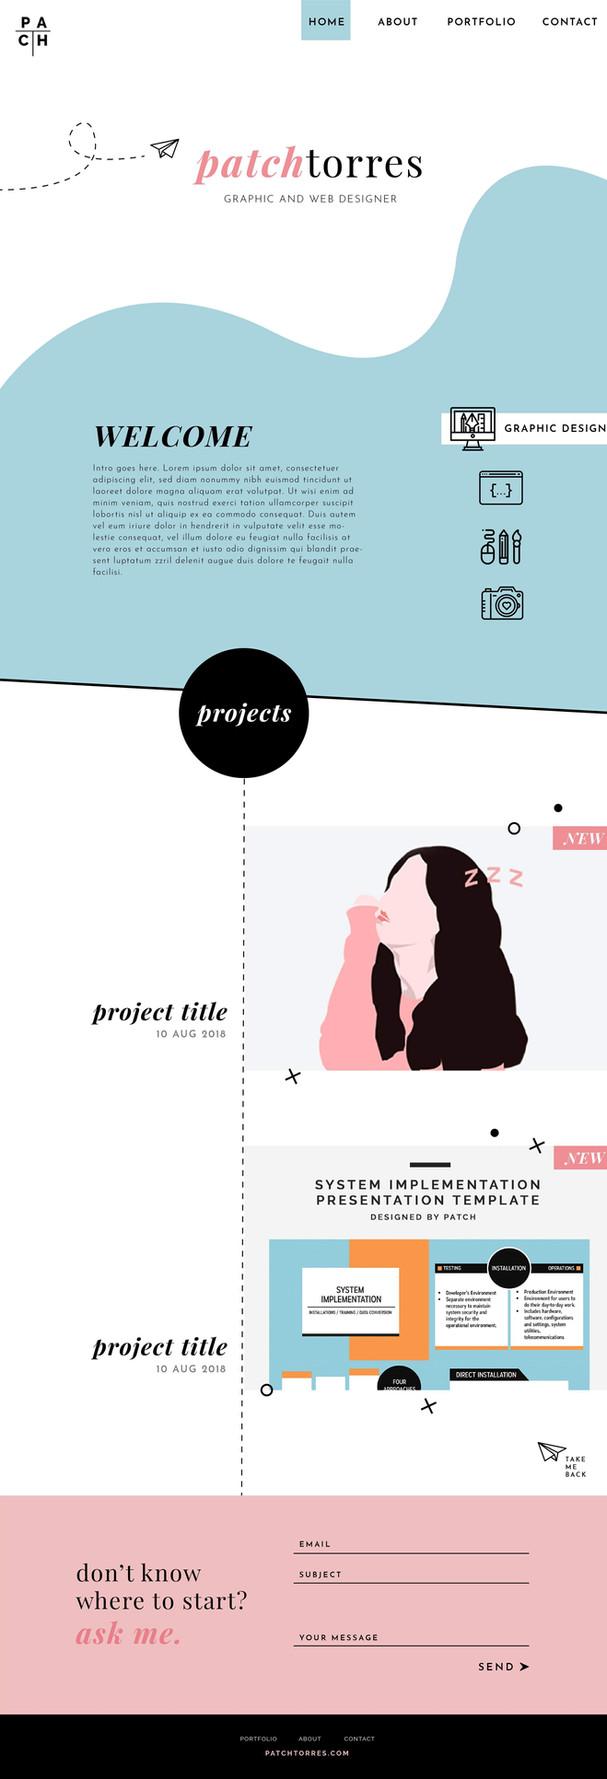 Personal Online Portfolio Web Design